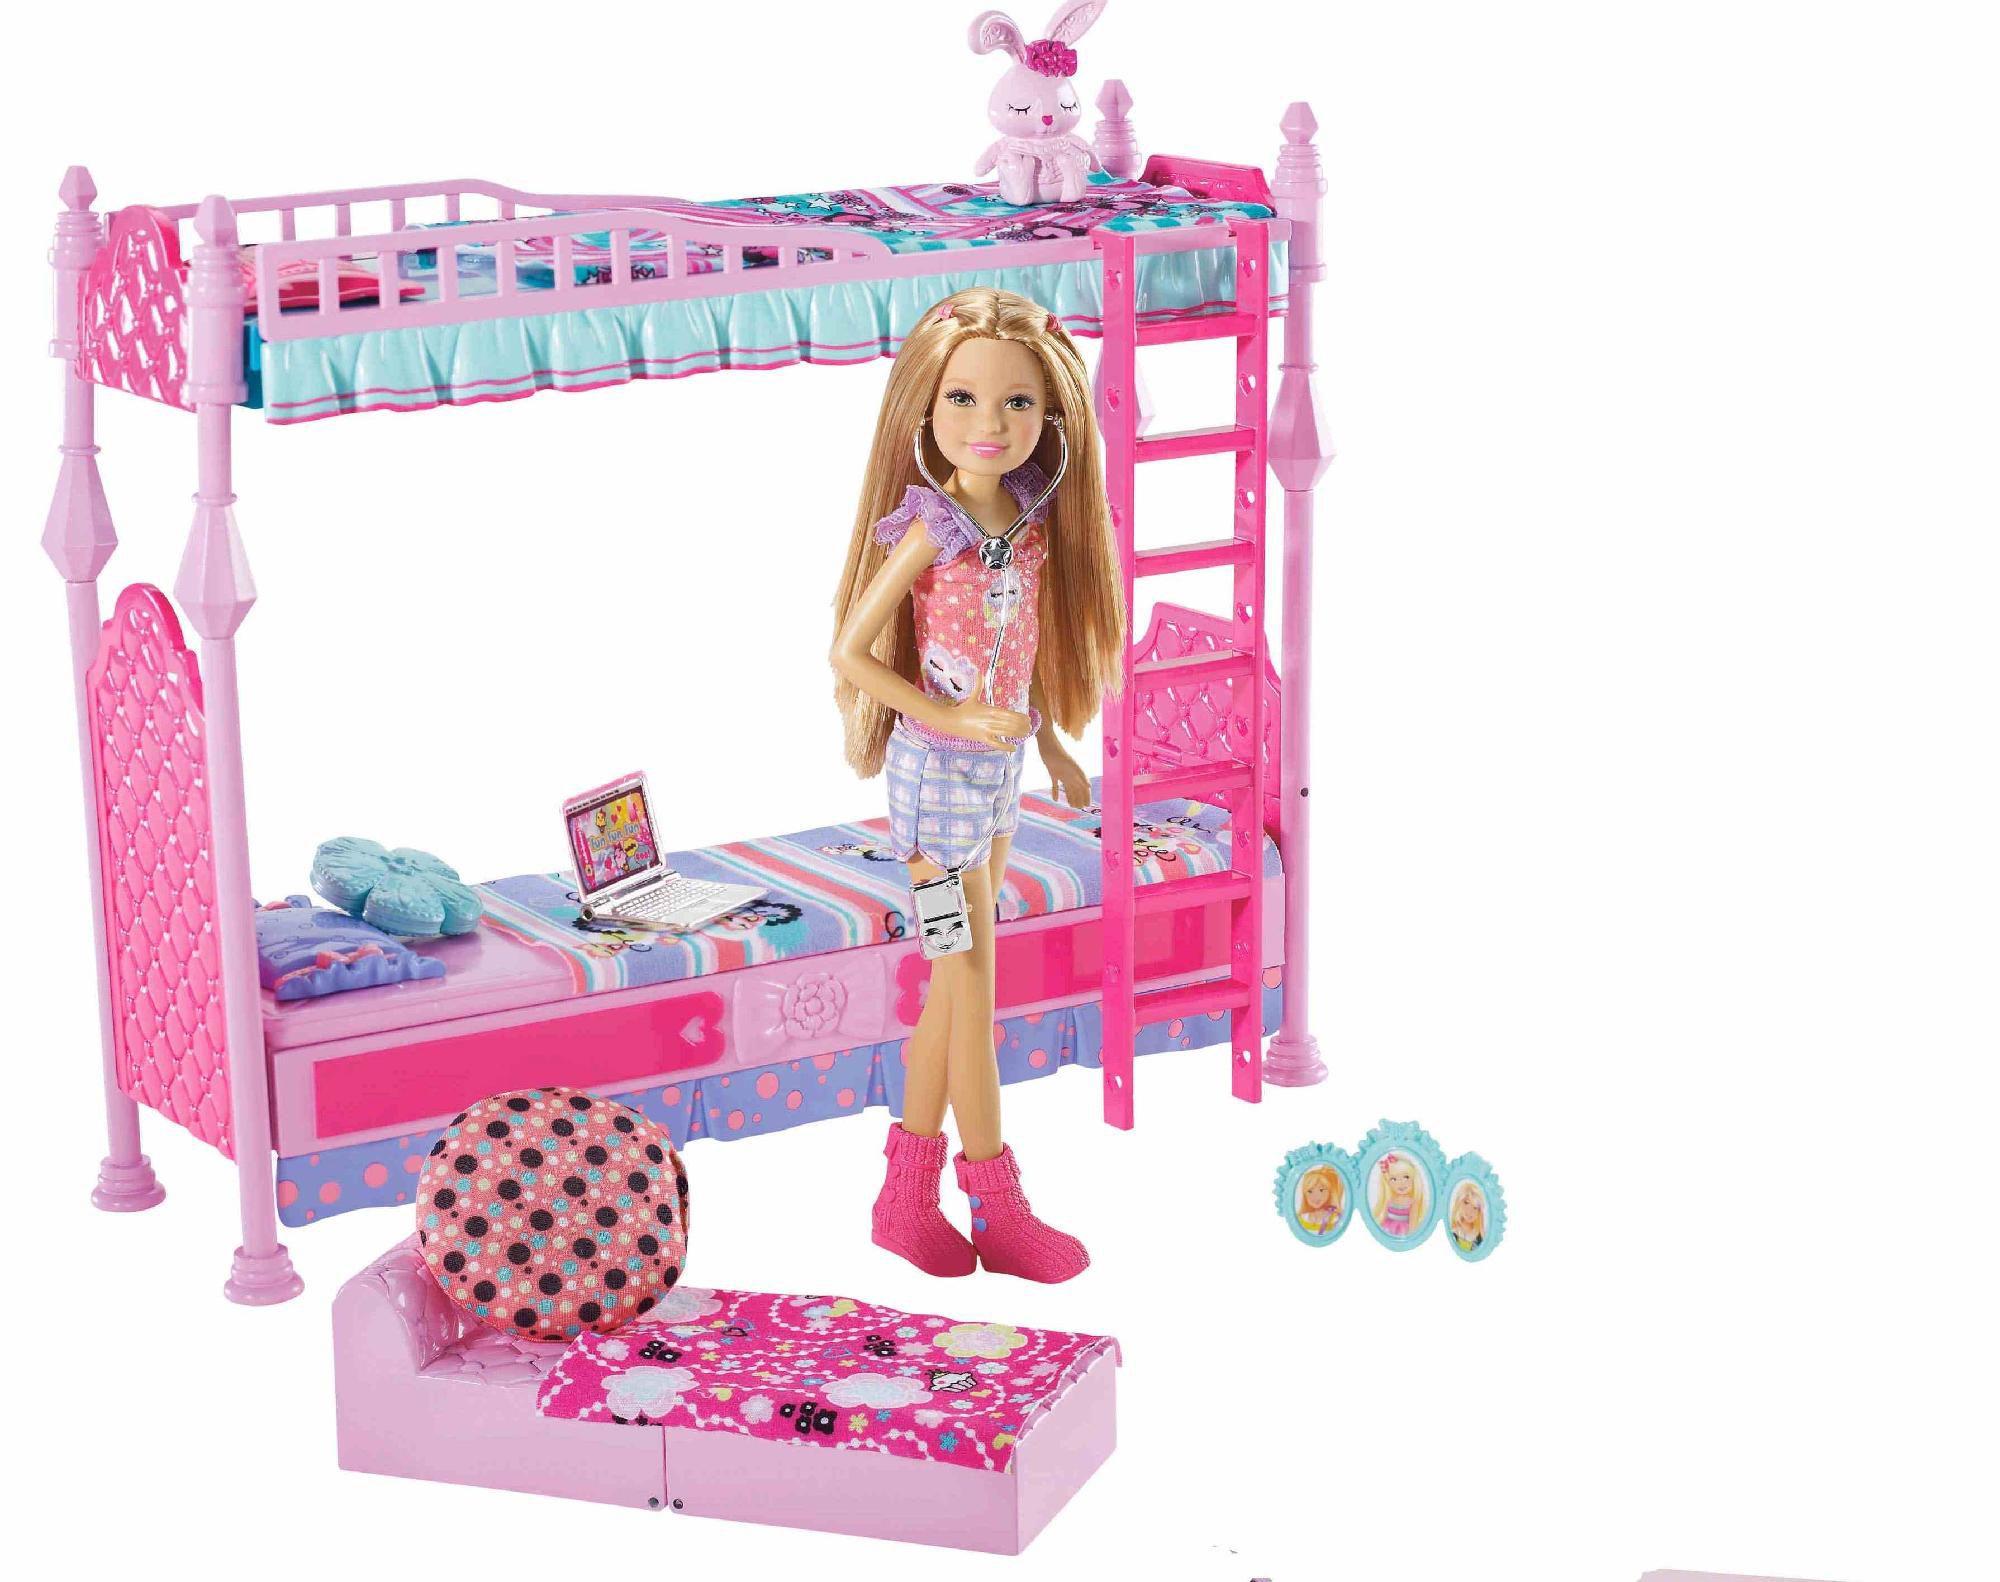 Barbie 174 Sisters Sleeptime Bedroom For 3 Furniture